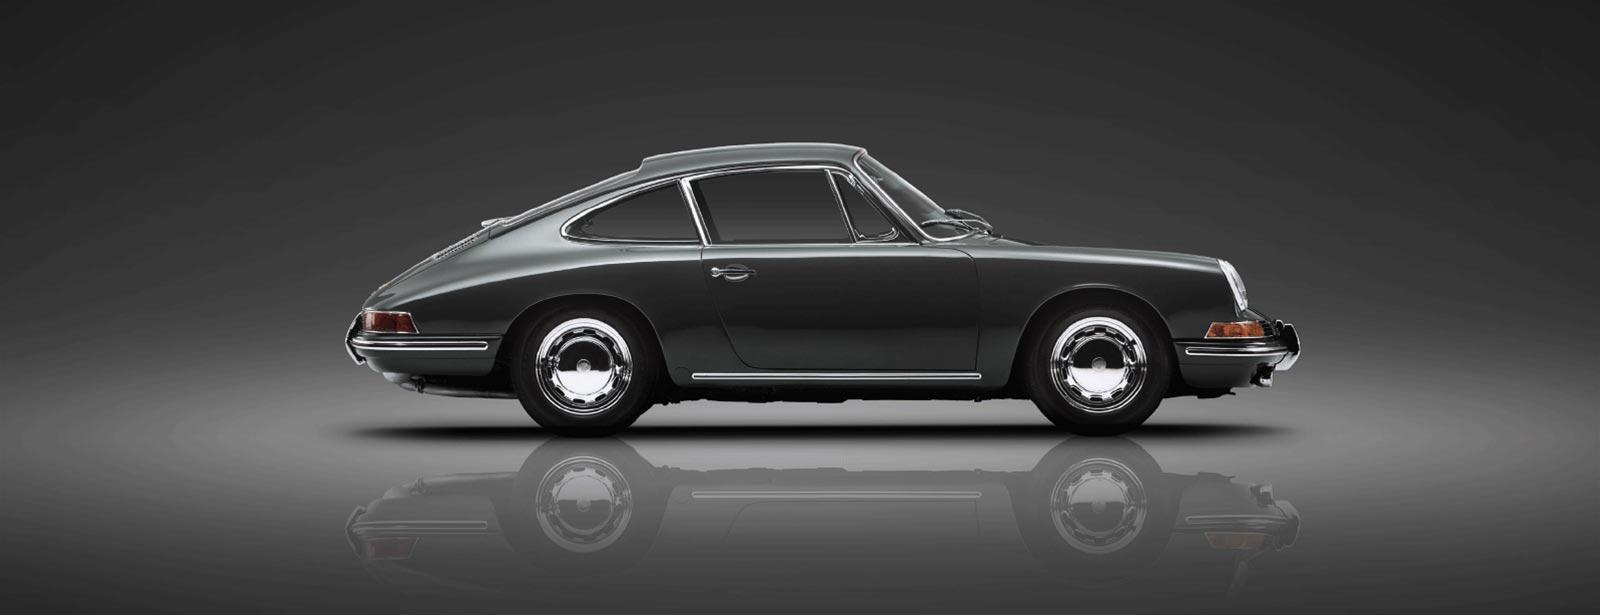 Classic experience. - Porsche Classic Center Gelderland.